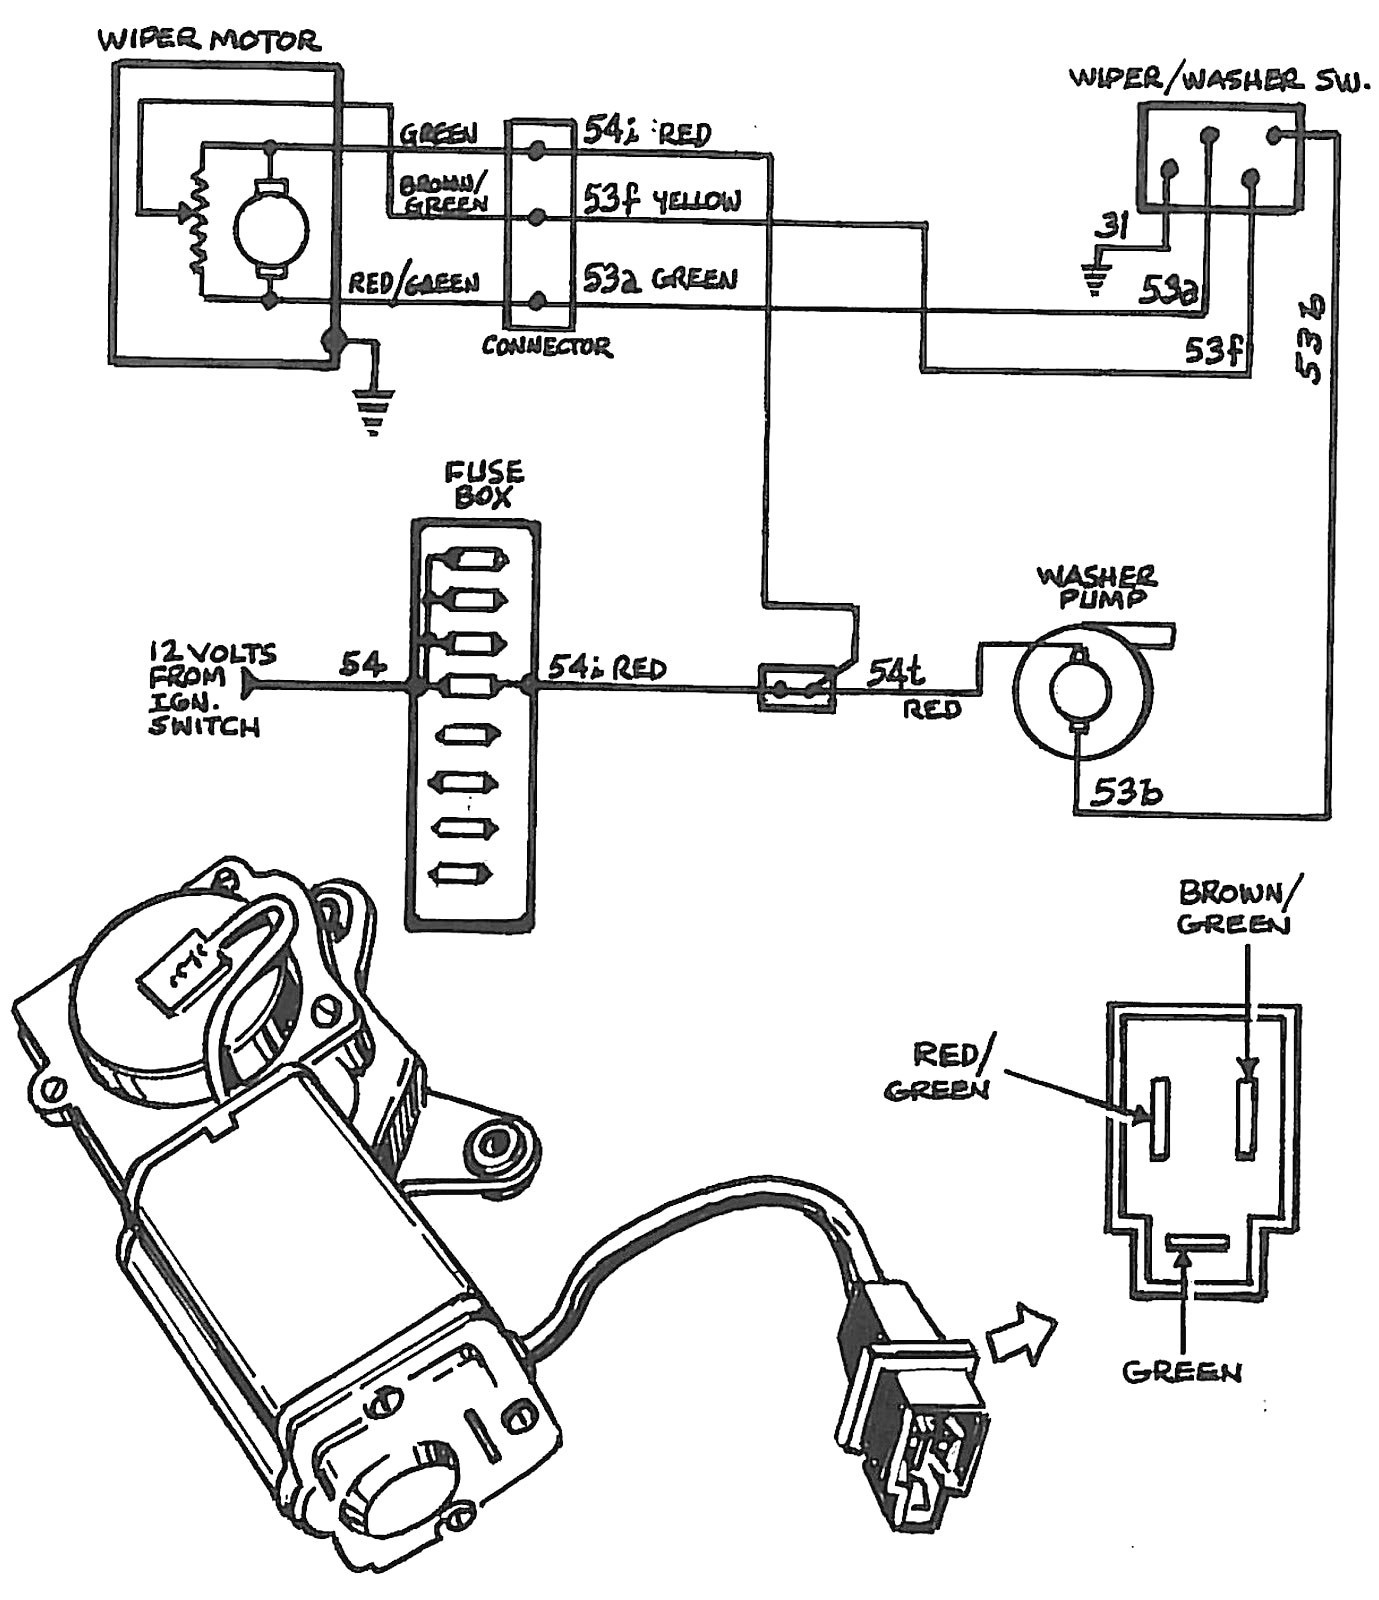 studebaker wiper switch wiring electrical wiring diagrams Imperial Wiring Diagrams 1957 studebaker wiper motor wiring diy enthusiasts wiring diagrams u2022 ac switch wiring studebaker wiper switch wiring